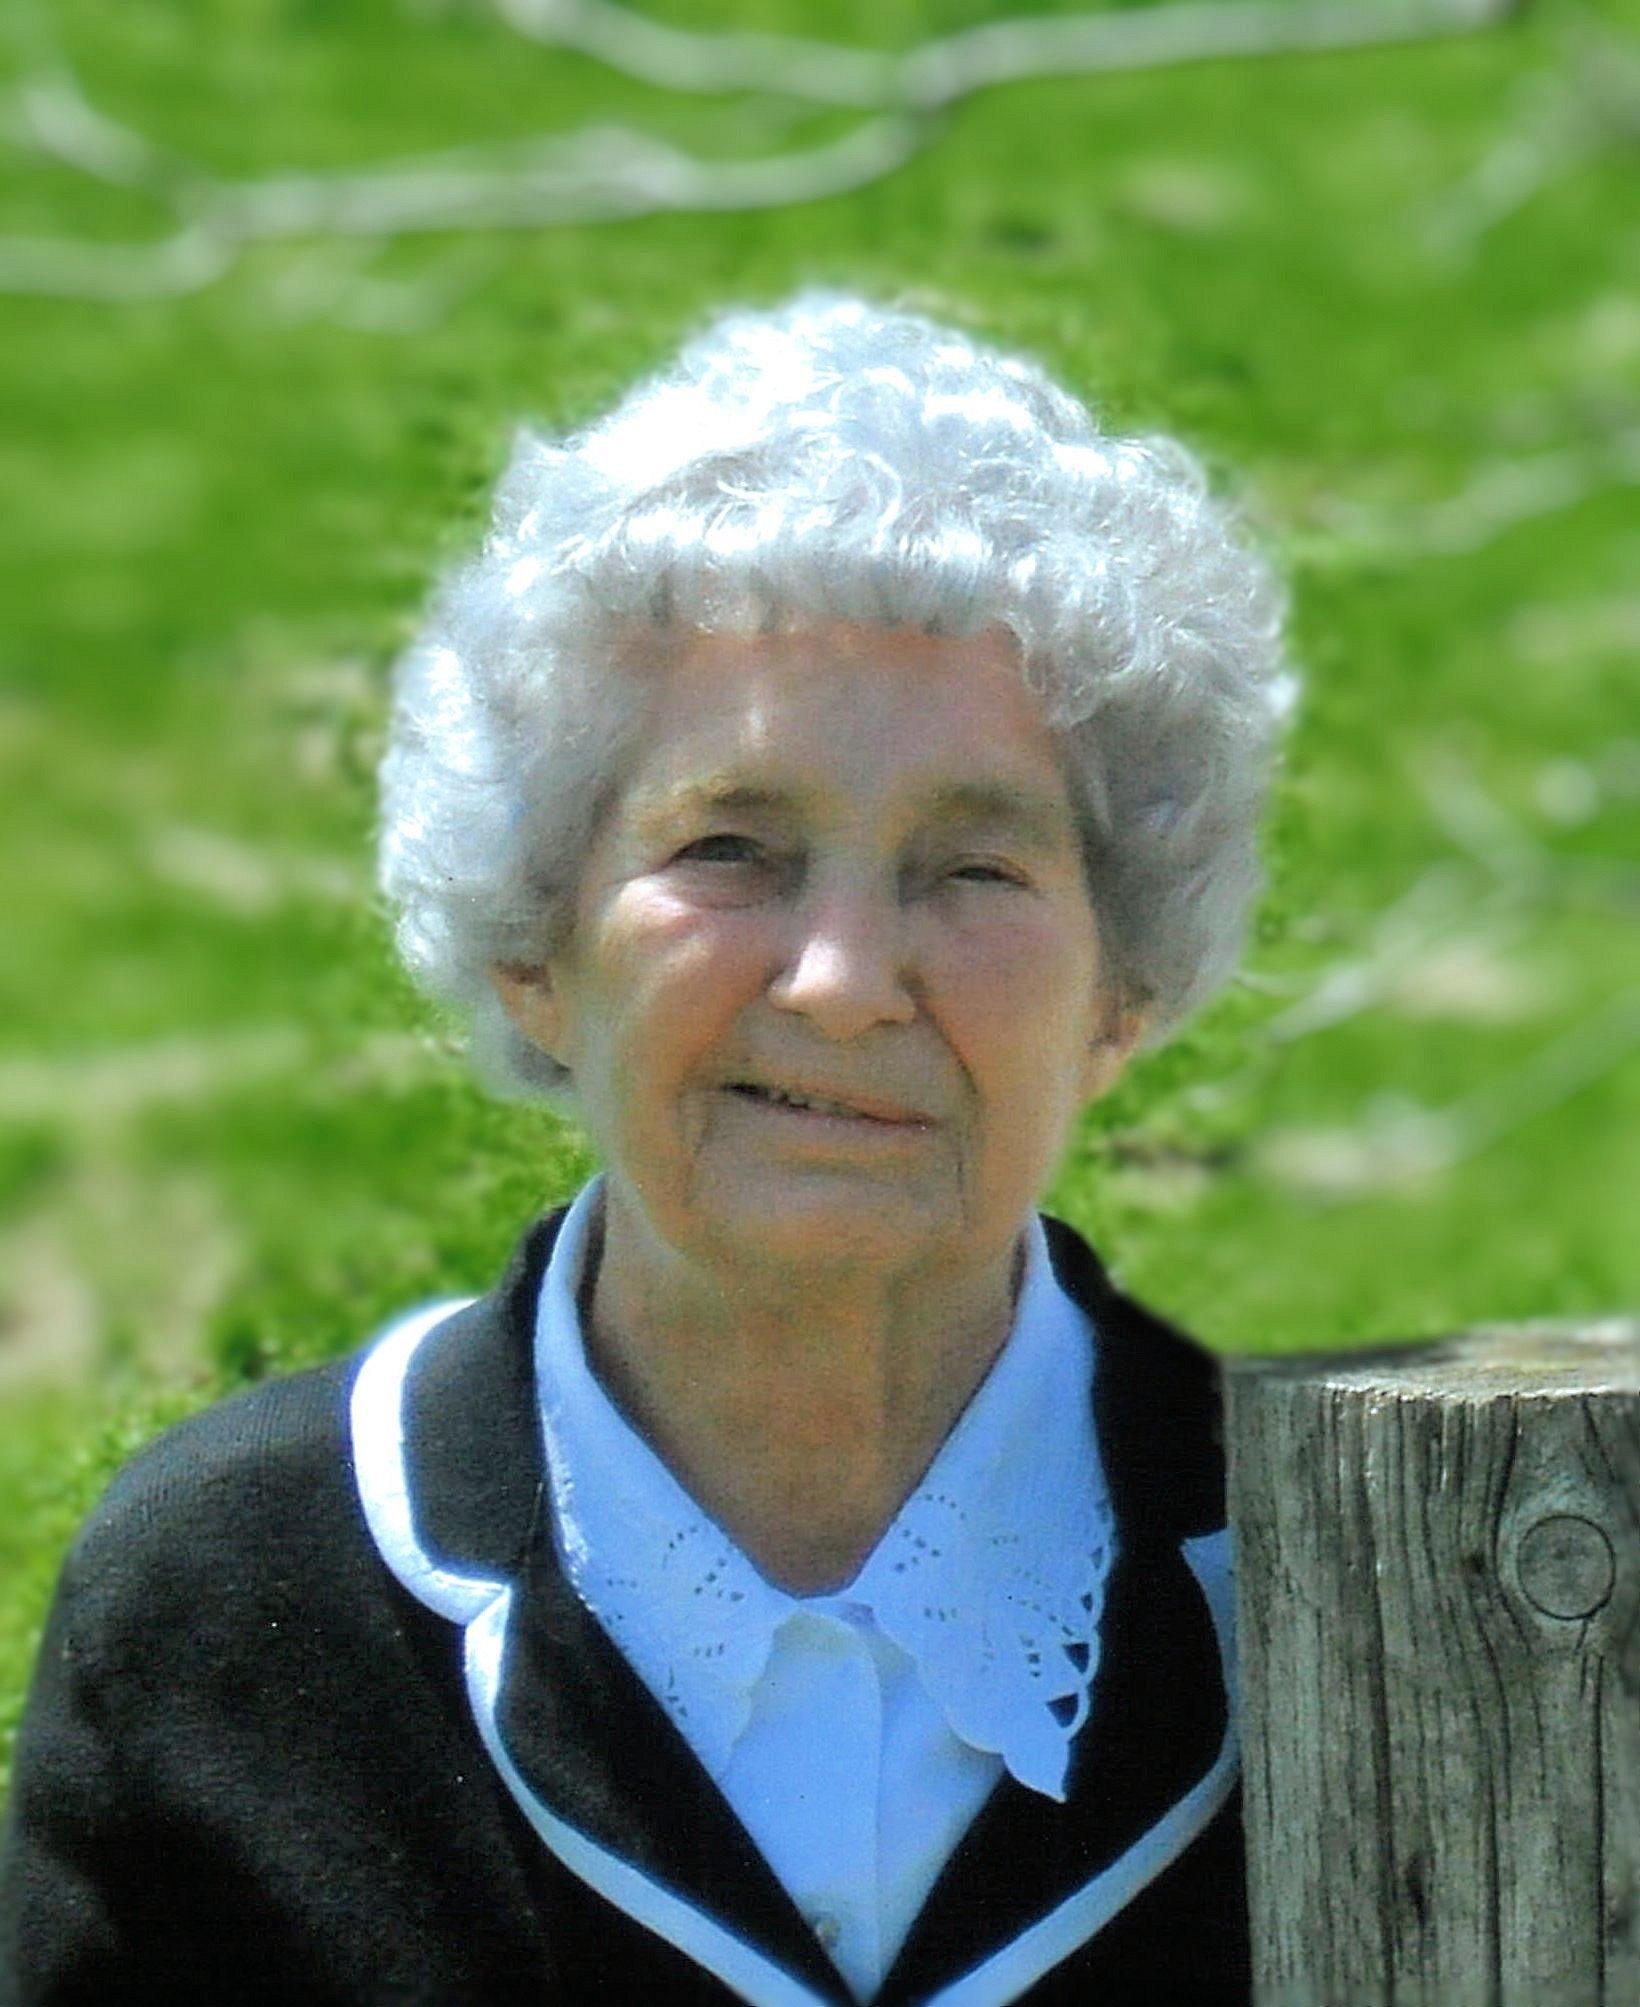 Lillian Nivins NichoIson